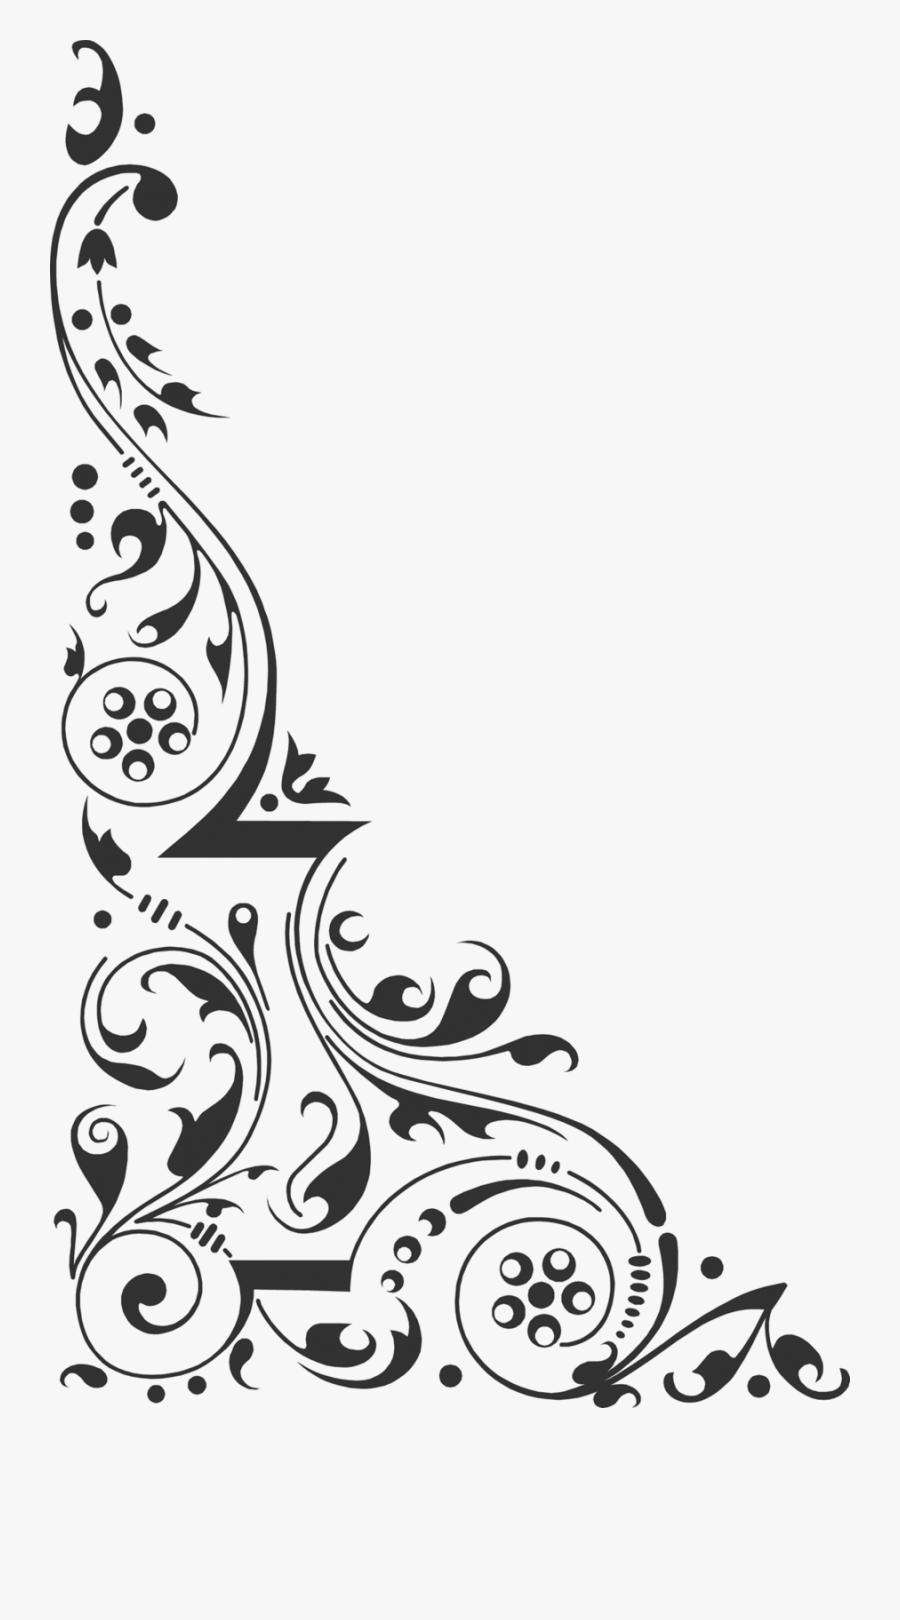 Corner Design Clipart Clip Art - Corner Design Png Black And White, Transparent Clipart